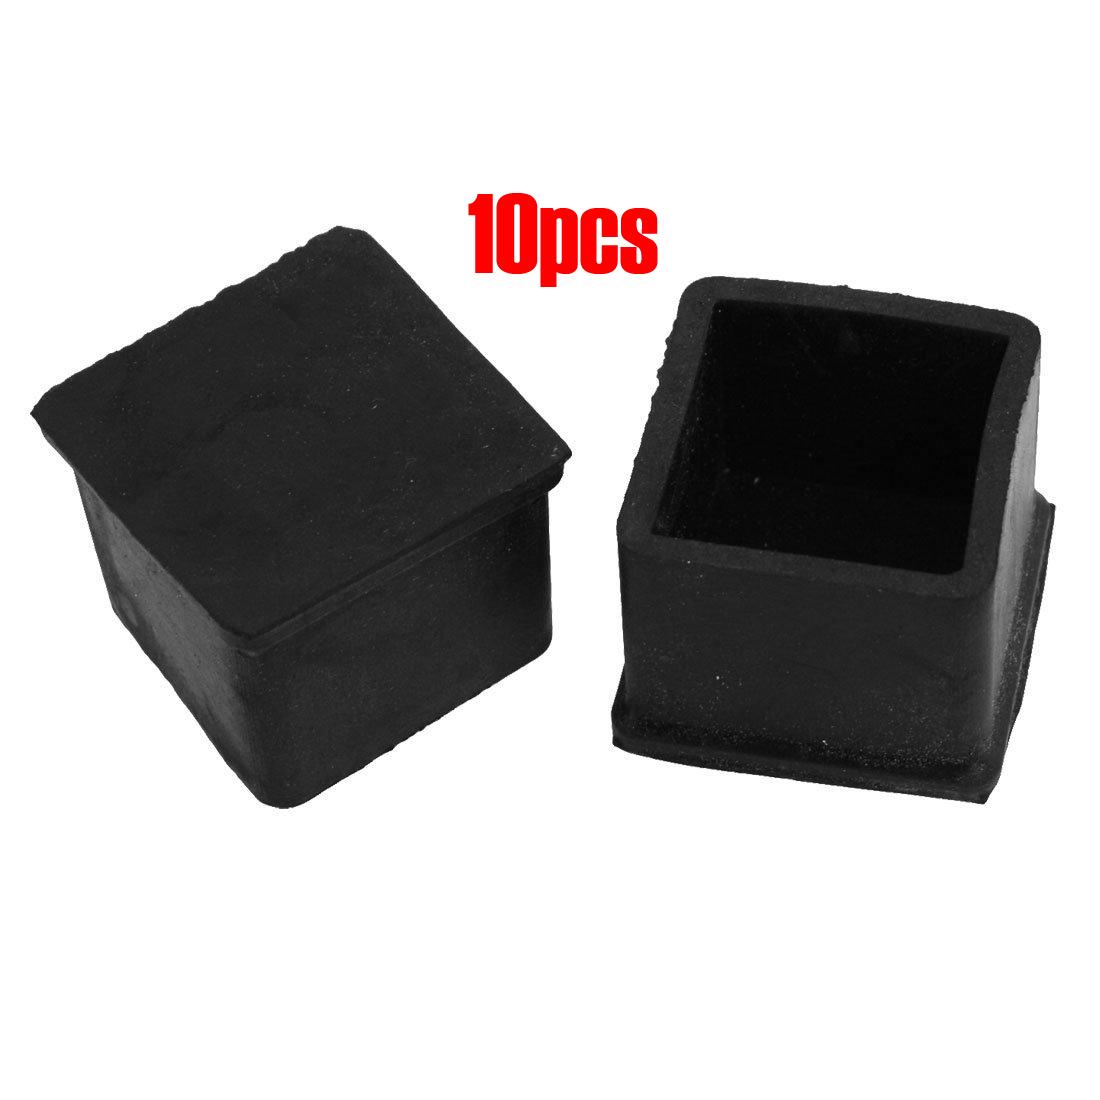 sofa feet covers rafferty traditional dark brown table 10 pcs black 30mm x furniture foot protector square